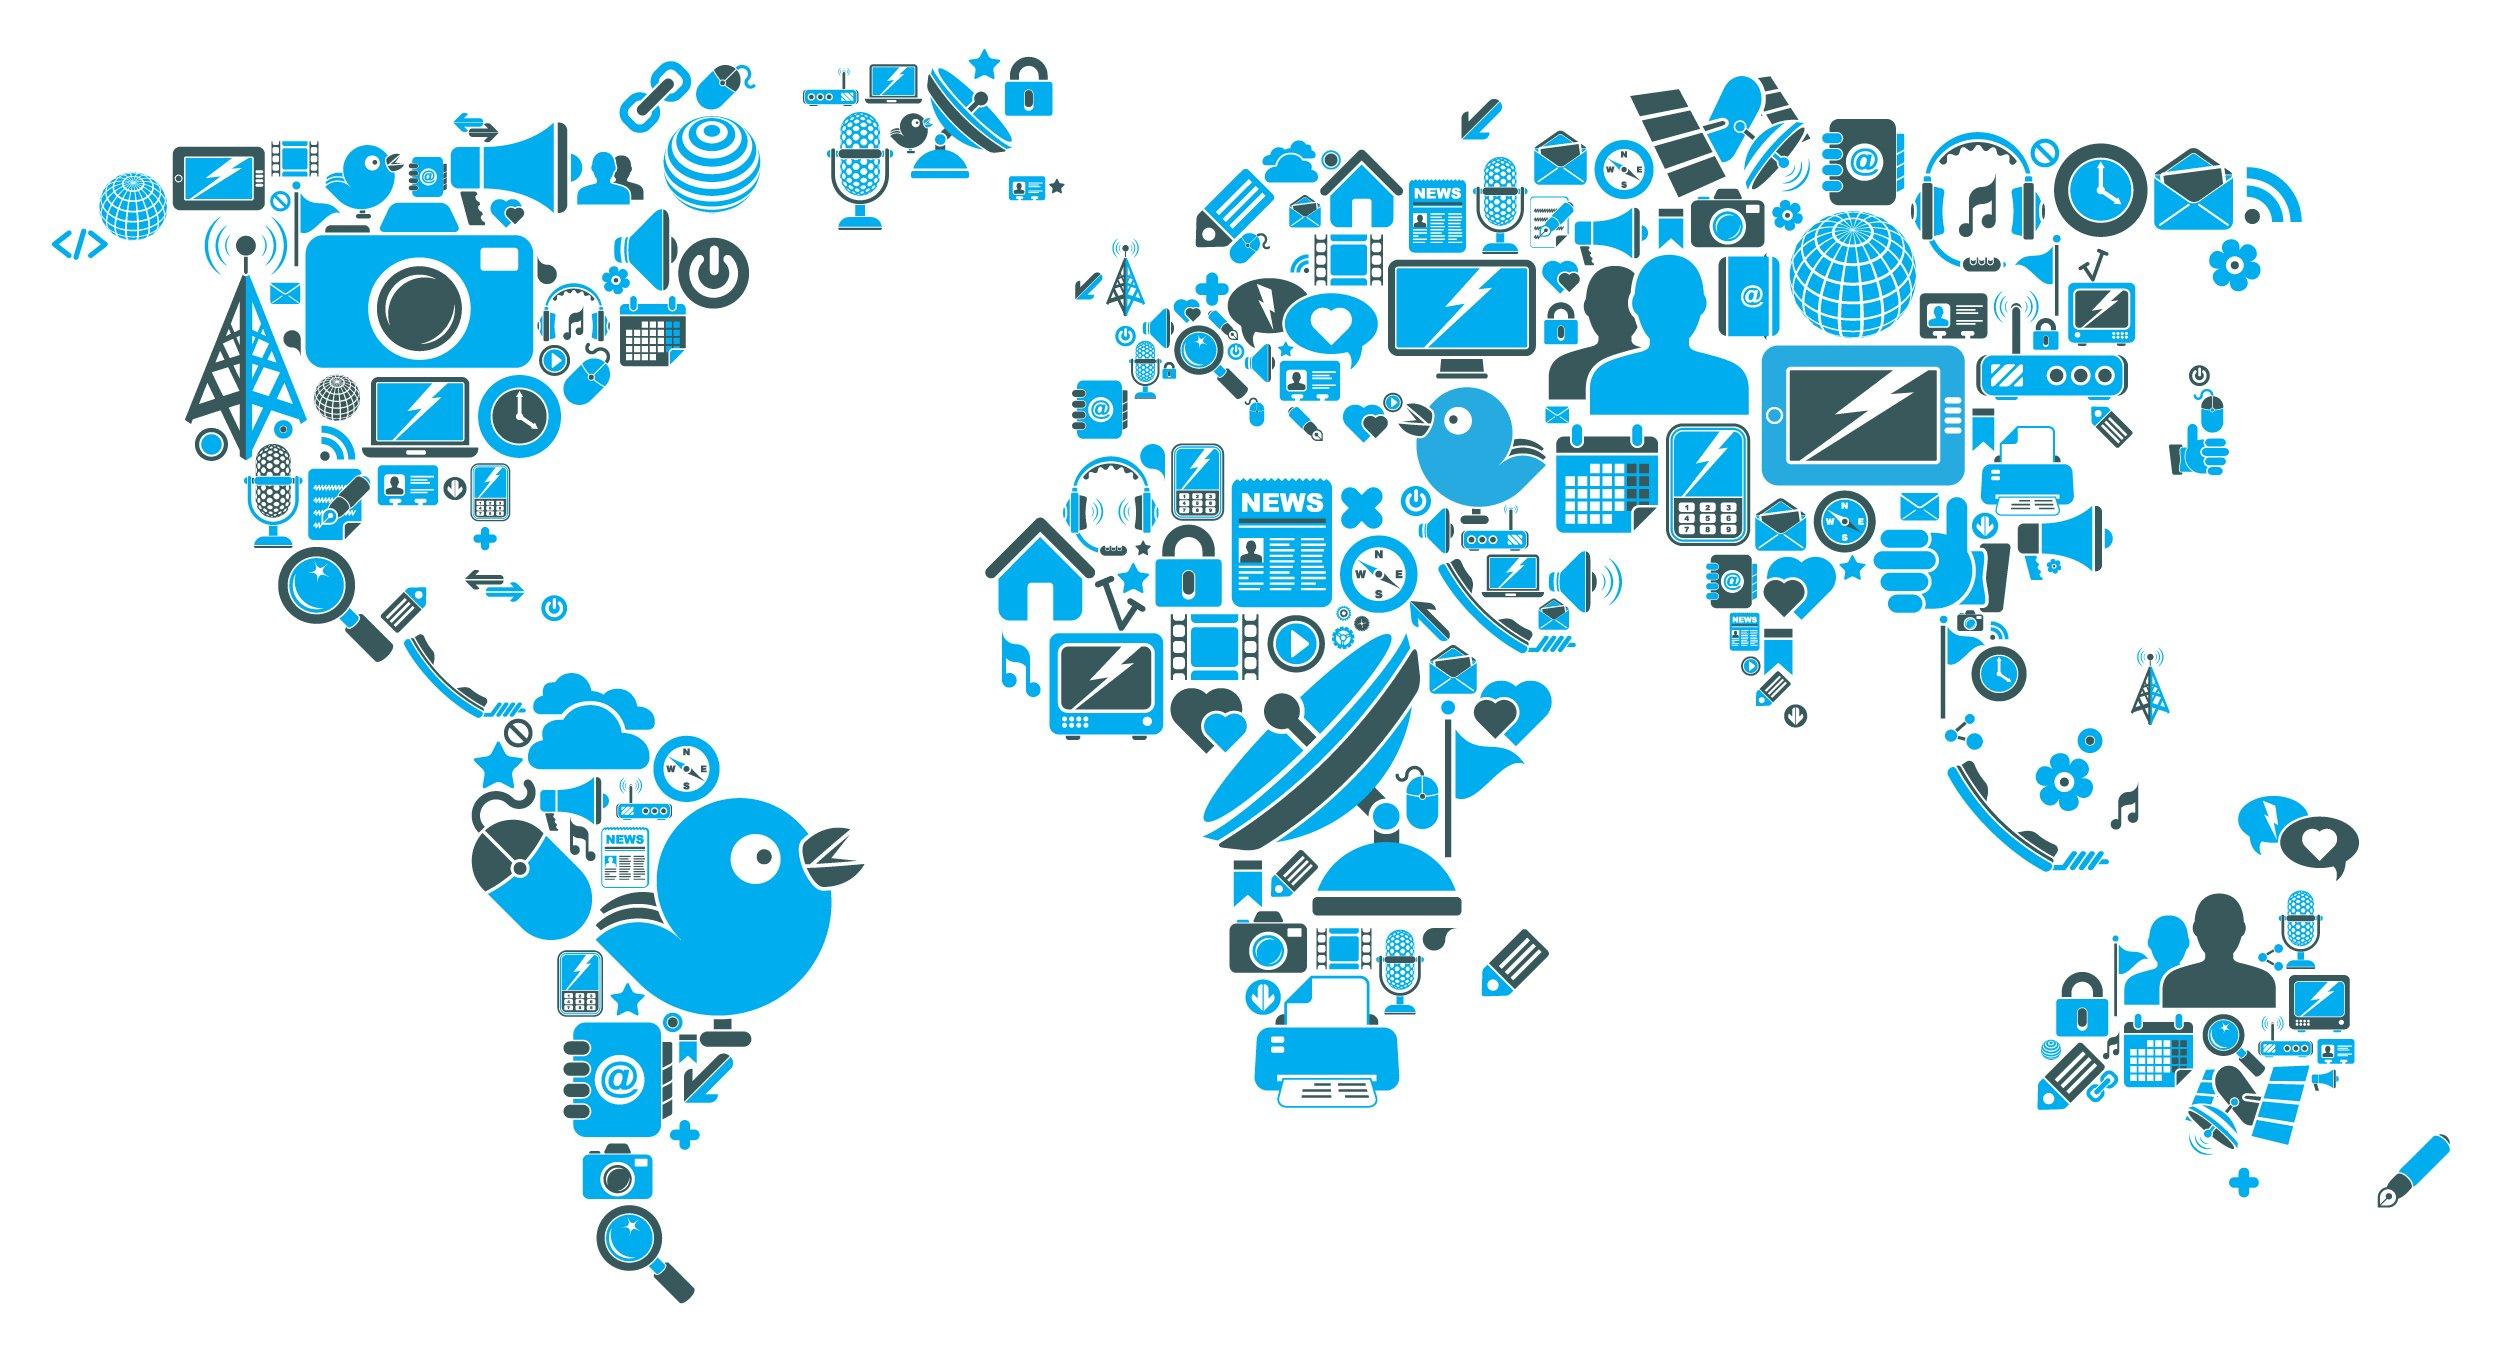 Internet of Things - Изображение 1